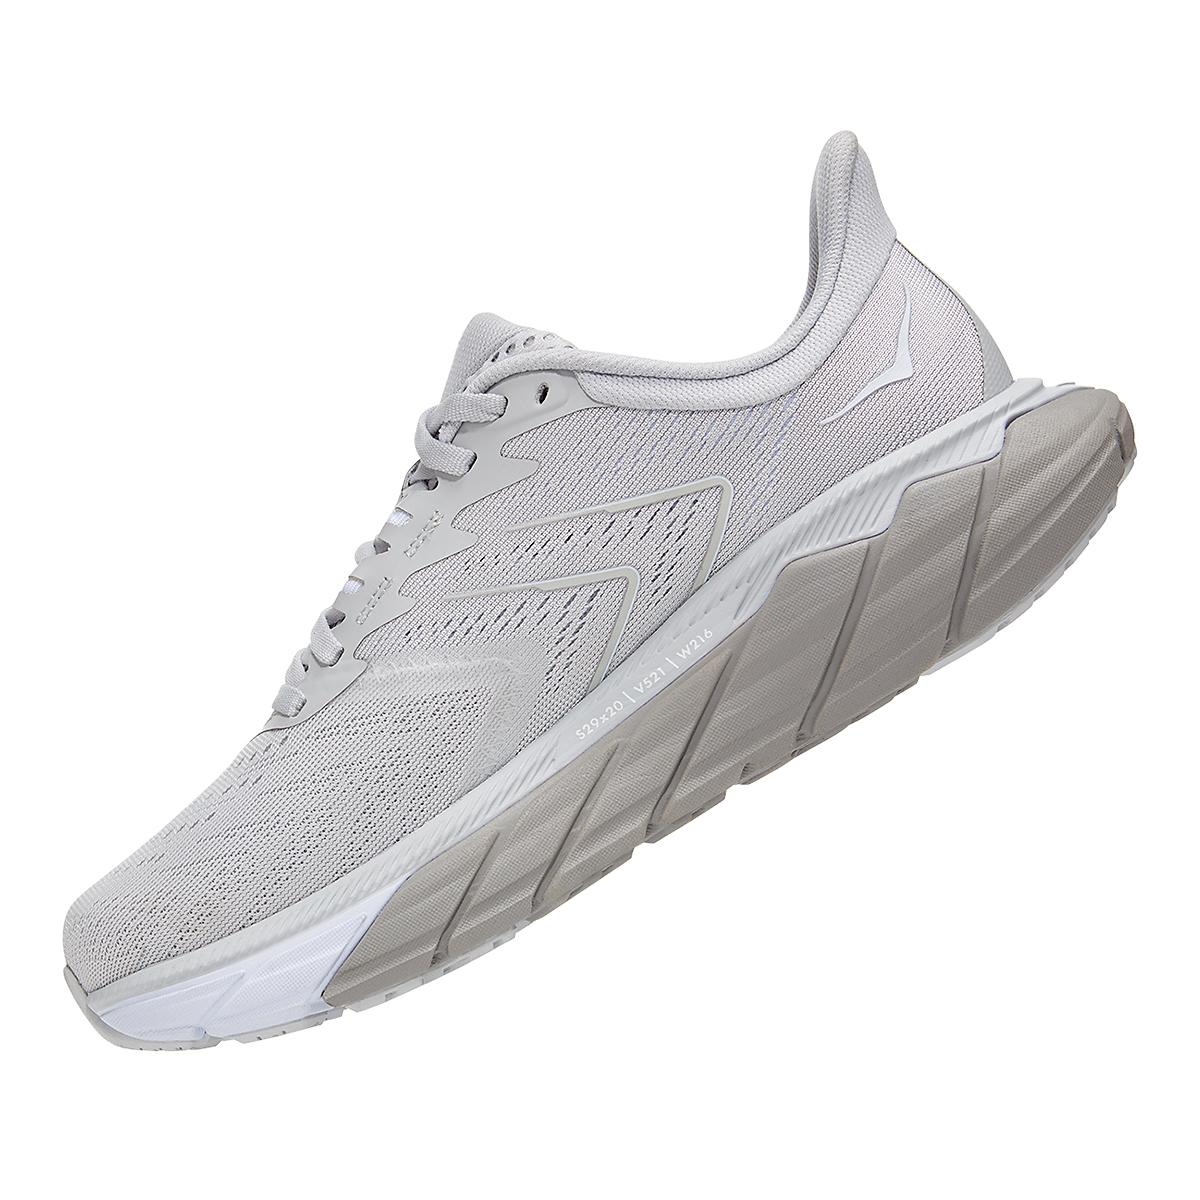 Women's Hoka One One Arahi 5 Running Shoe - Color: Lunar Rock - Size: 5 - Width: Regular, Lunar Rock, large, image 4